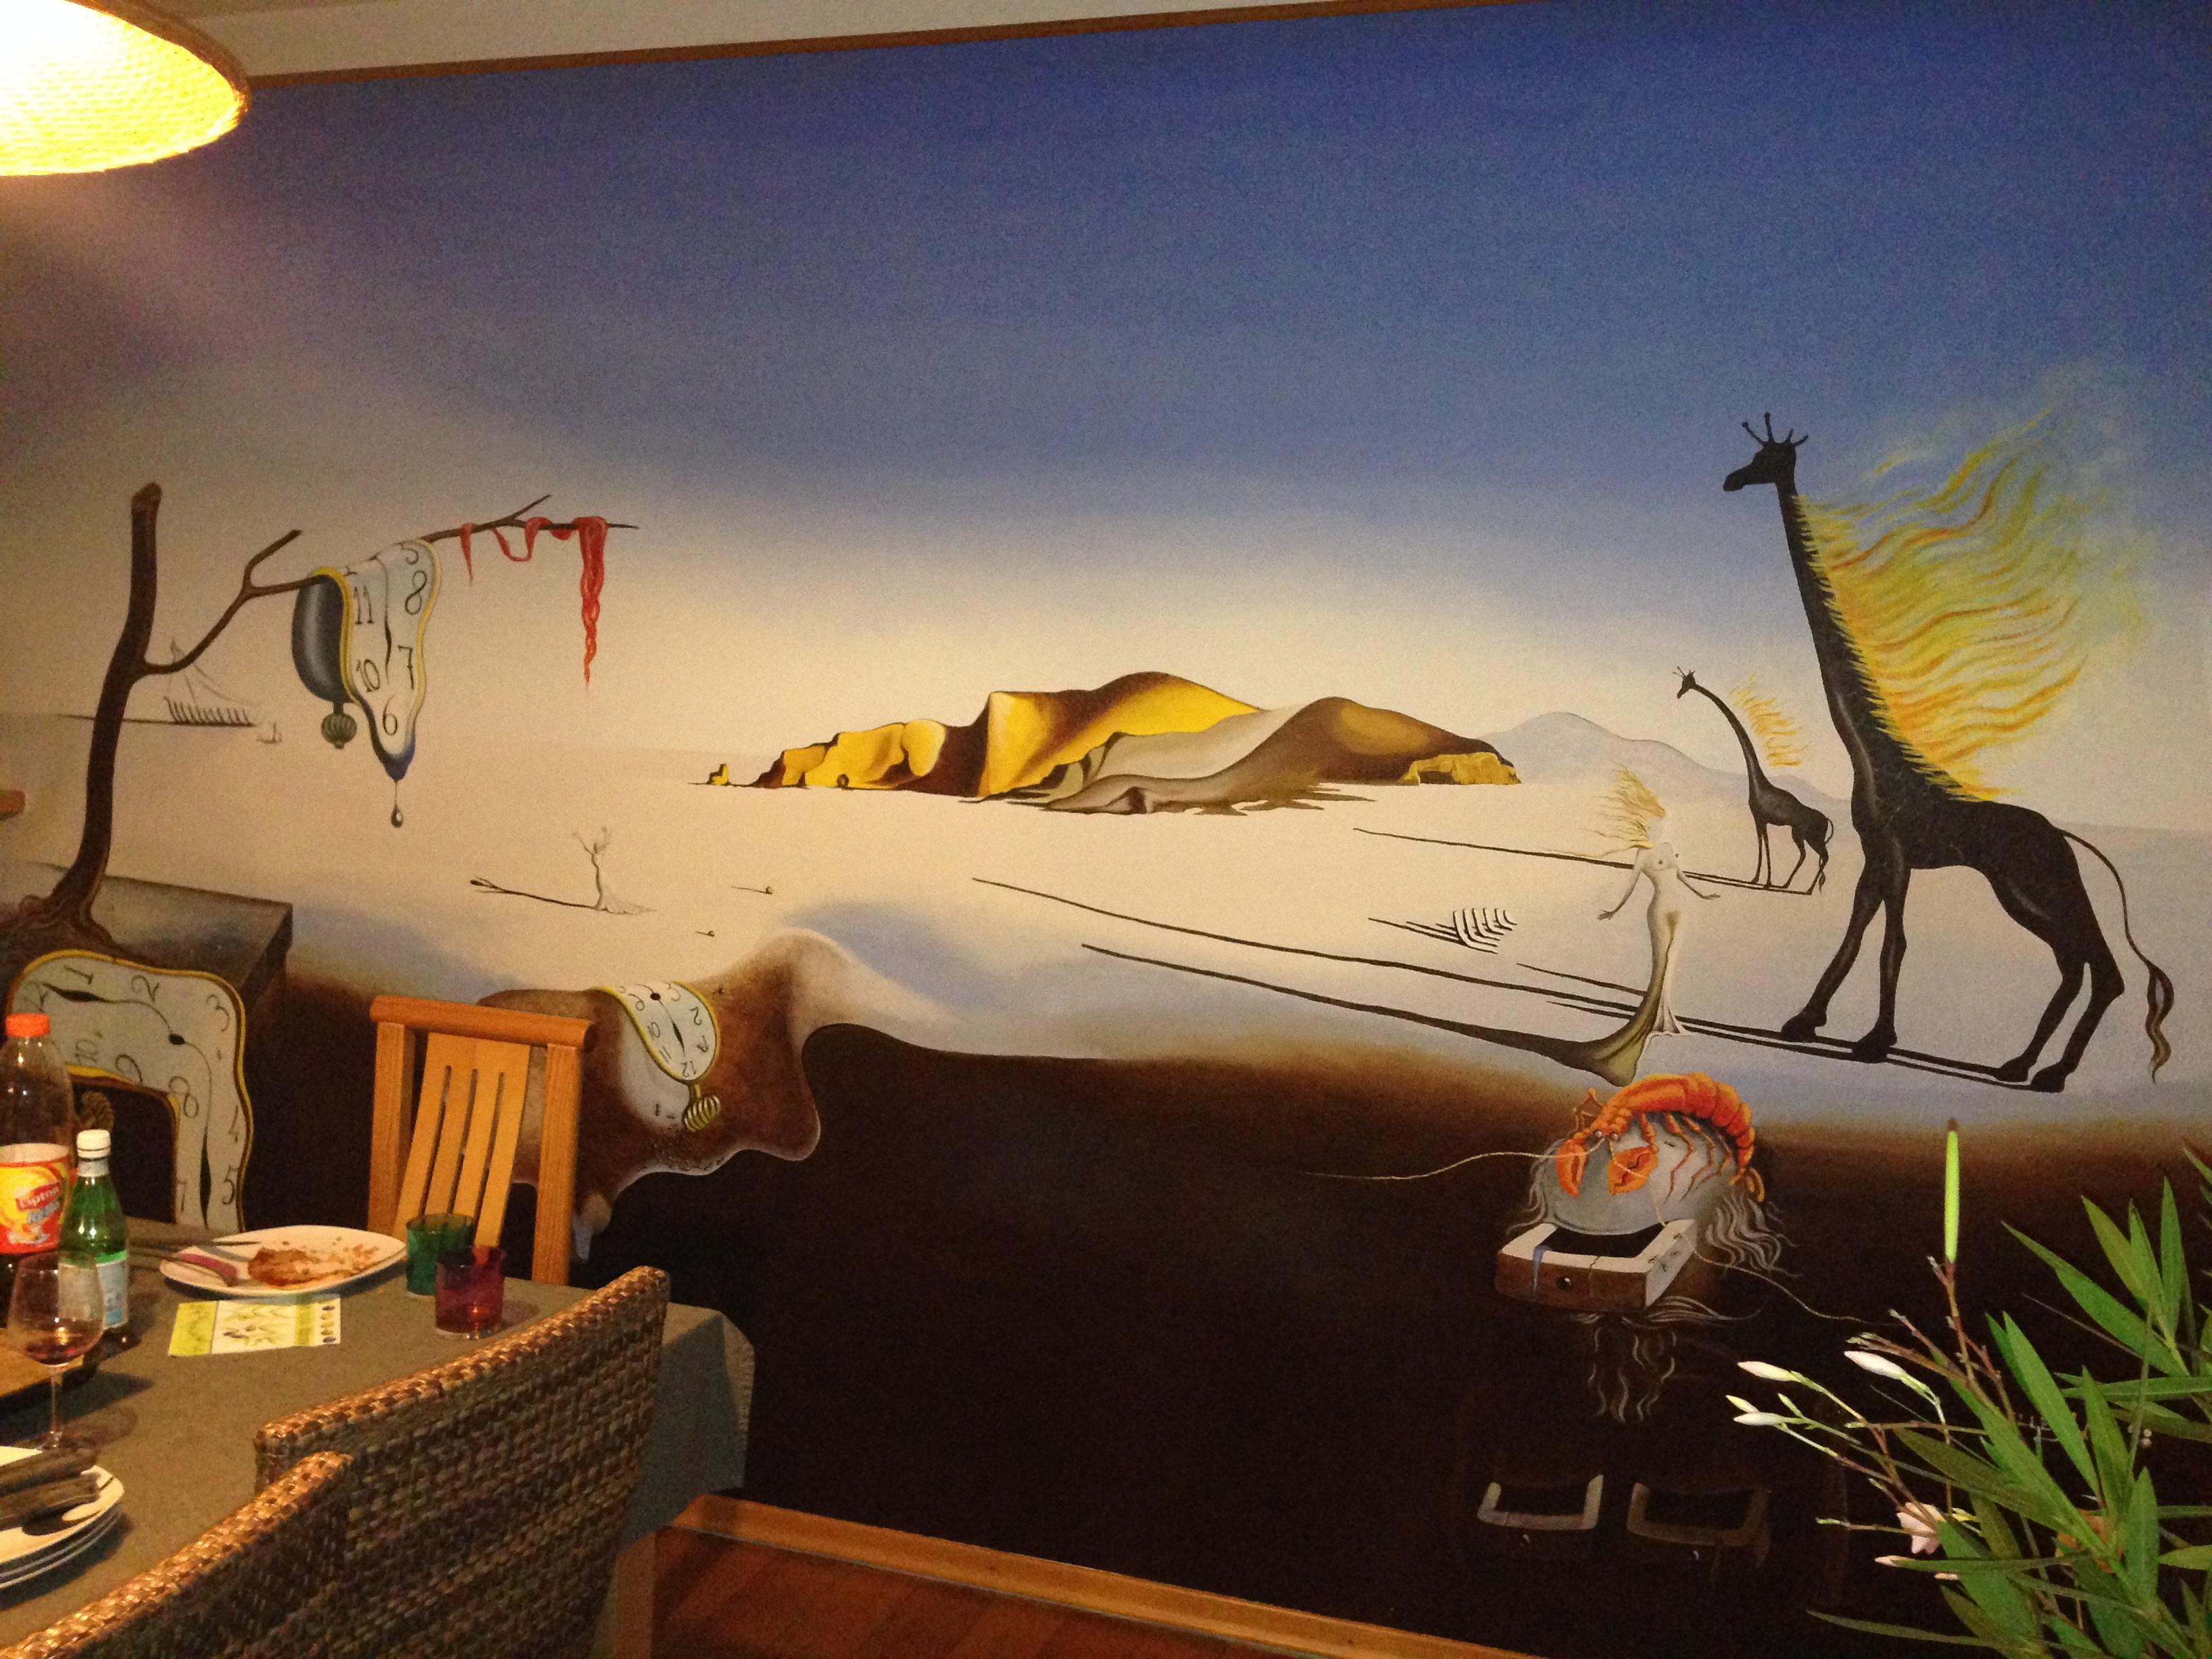 """Dali"" mural"